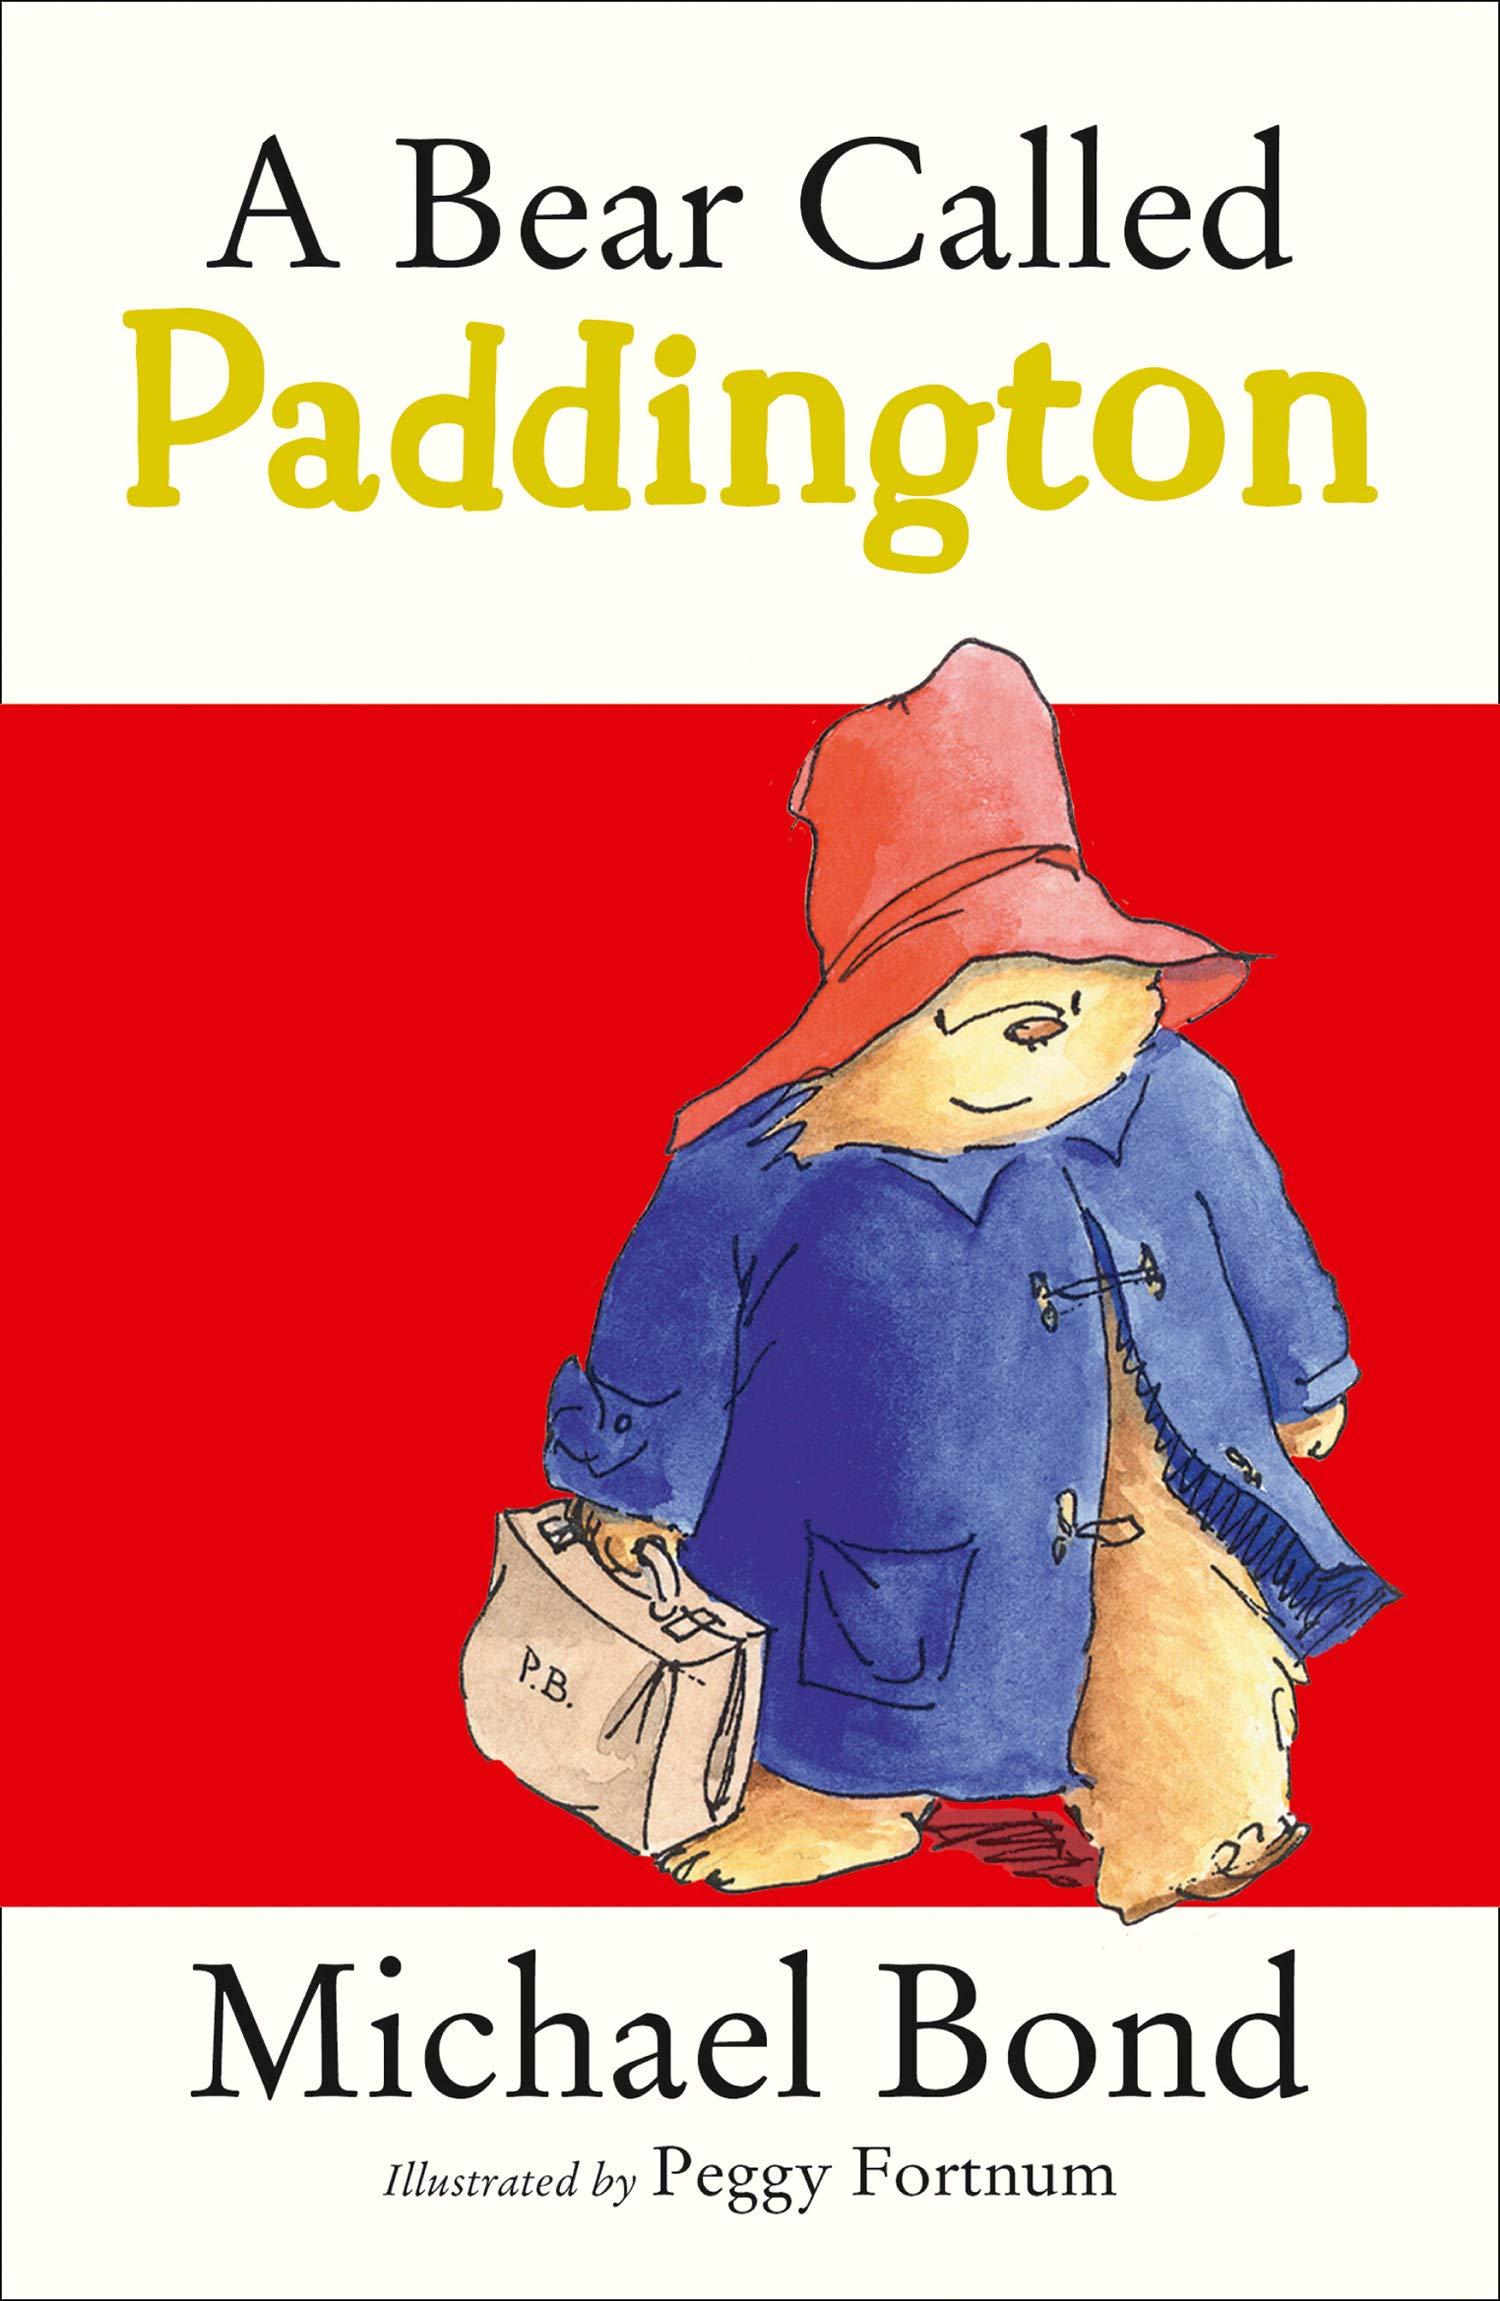 A Bear Called Paddington: Amazon.co.uk: Bond, Michael, Fortnum ...